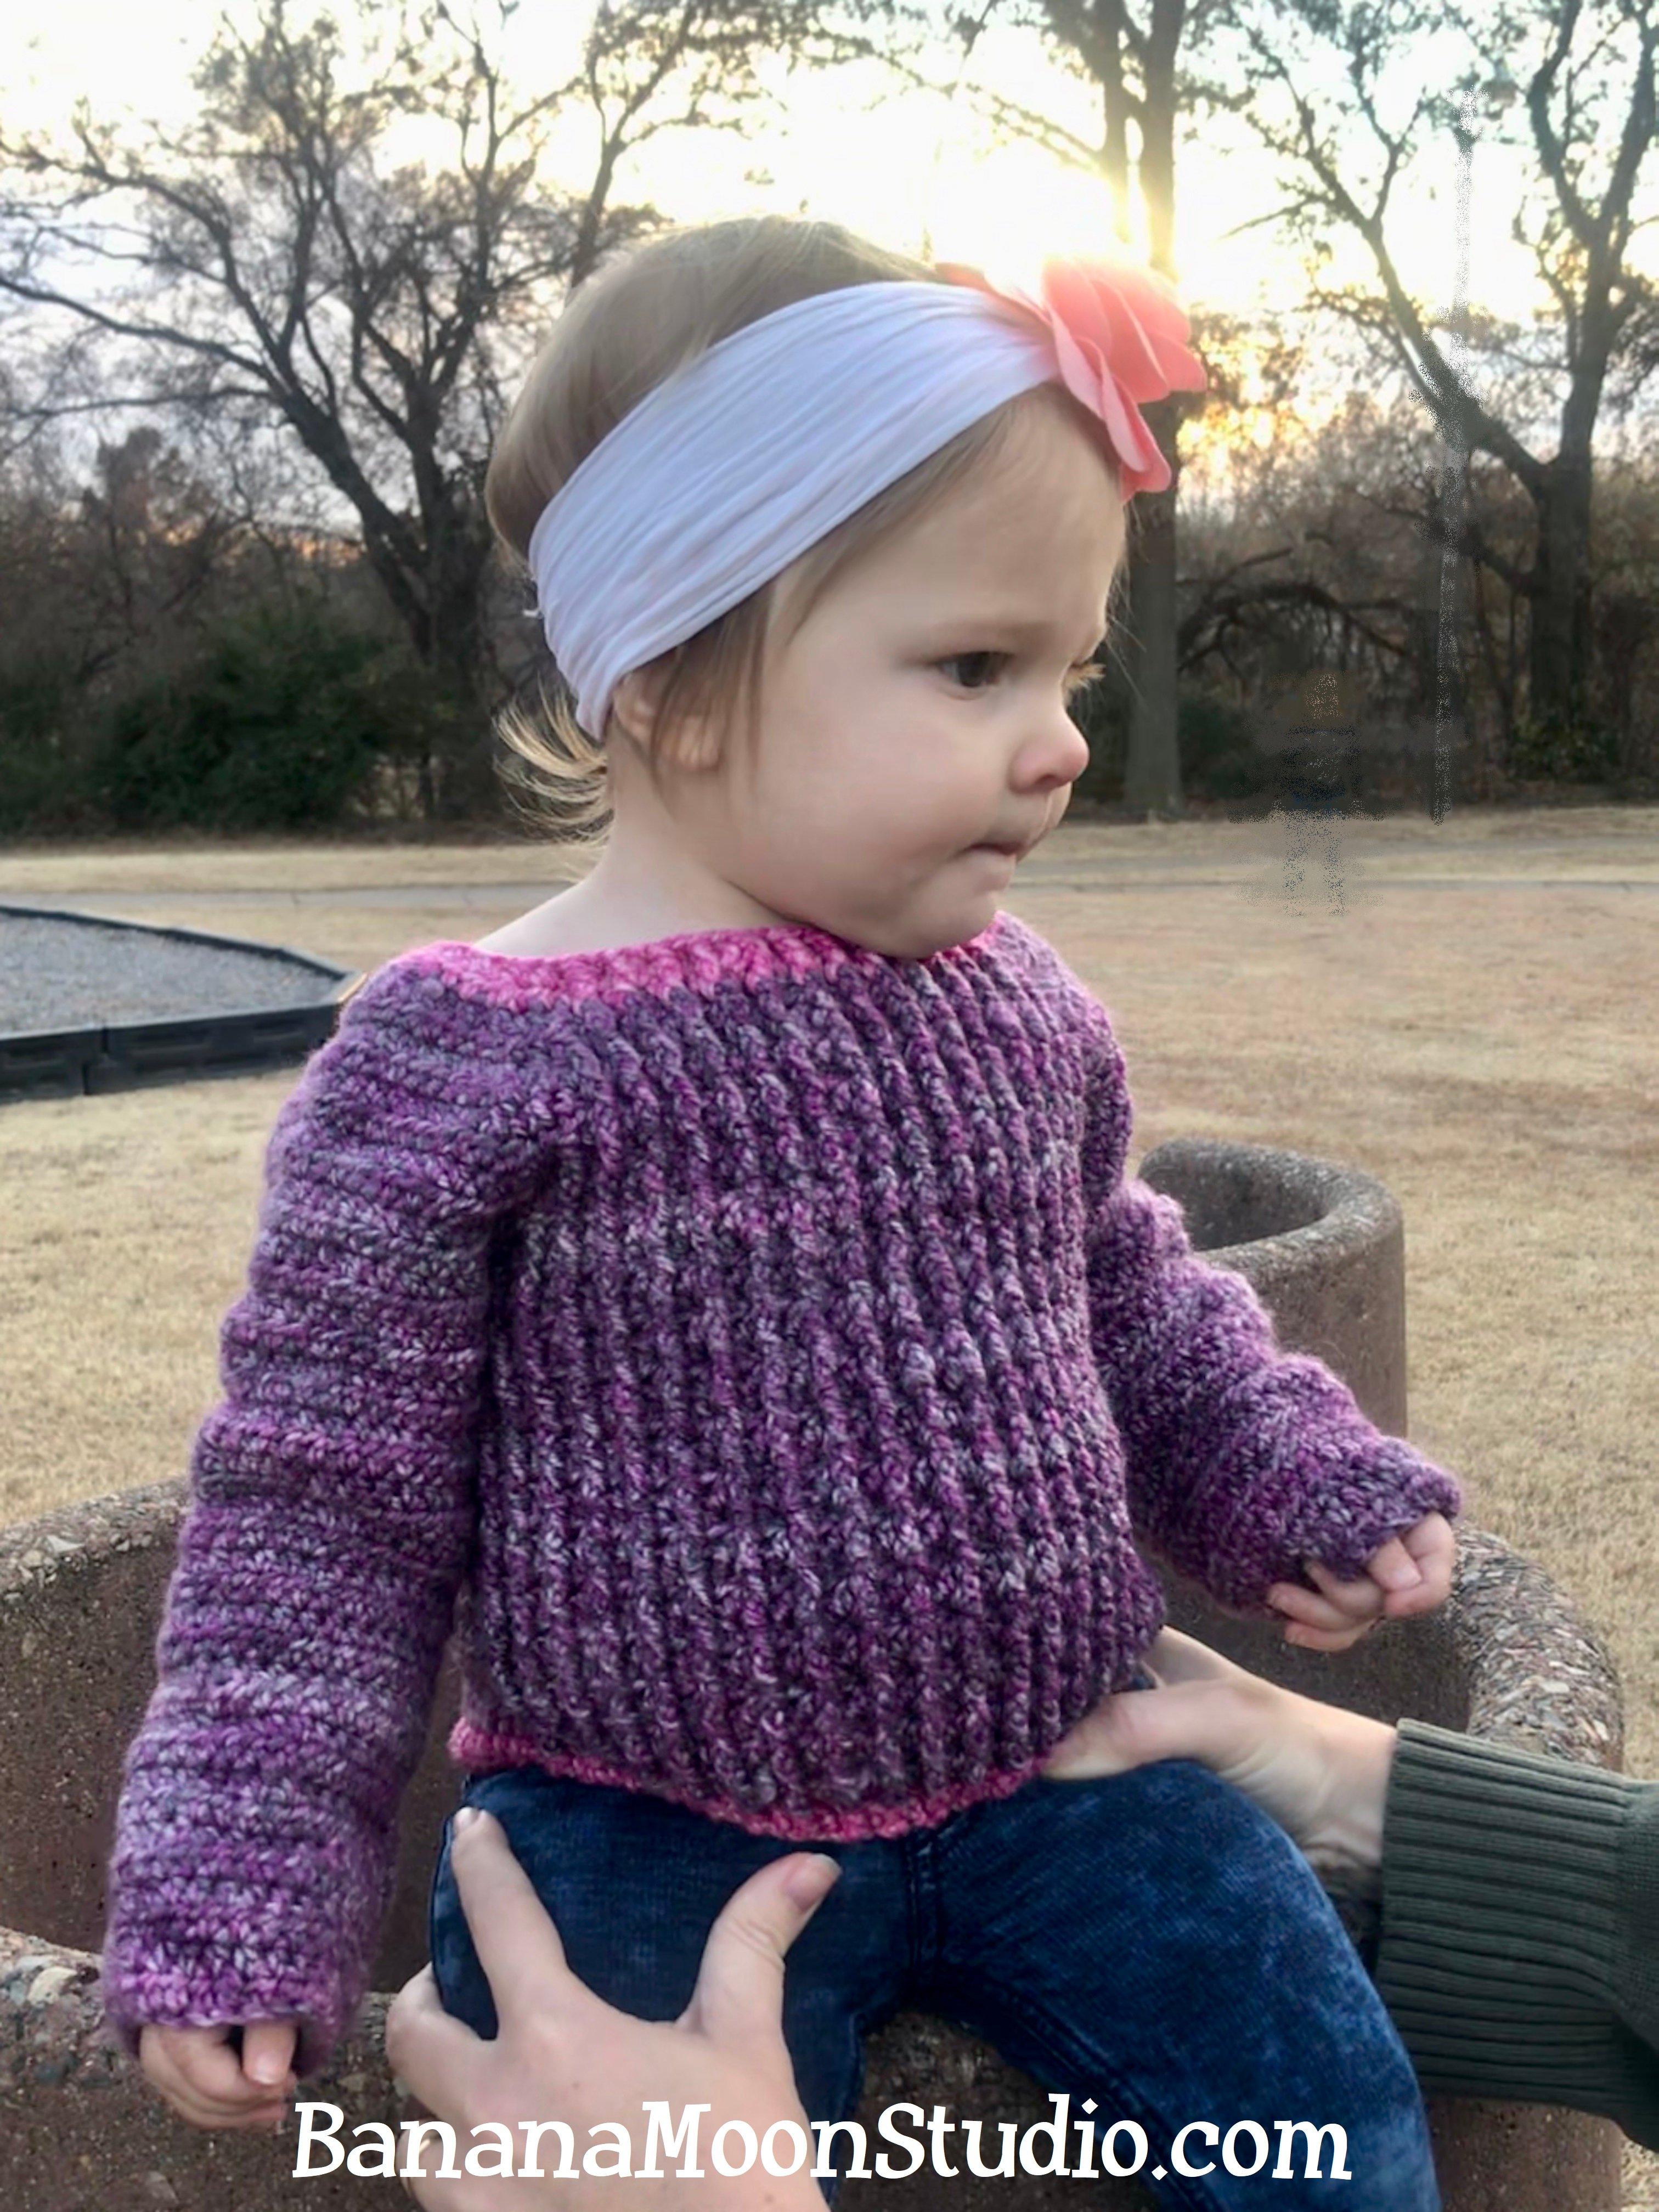 Pryor Creek Jr, FREE crochet pattern for a baby sweater from Banana Moon Studio